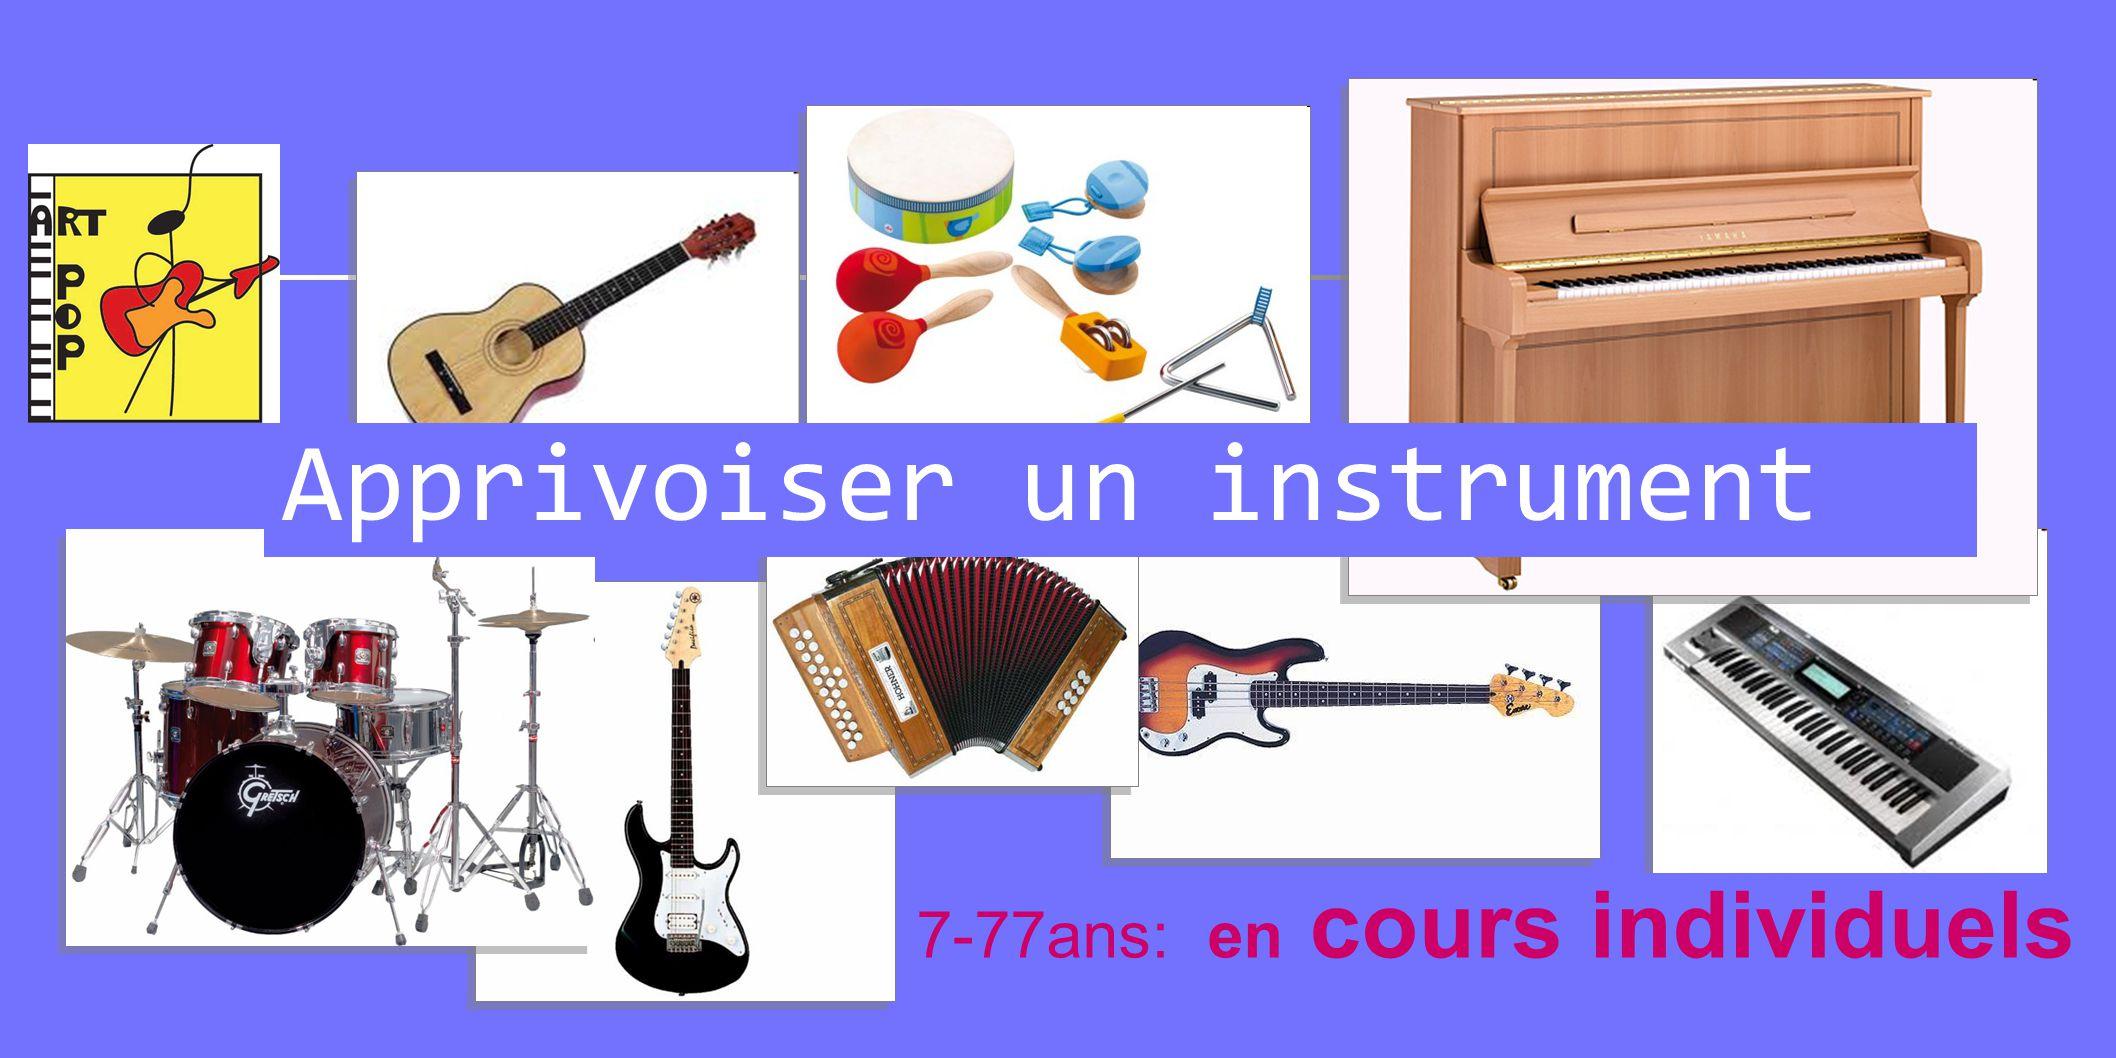 Apprivoiser un instrument